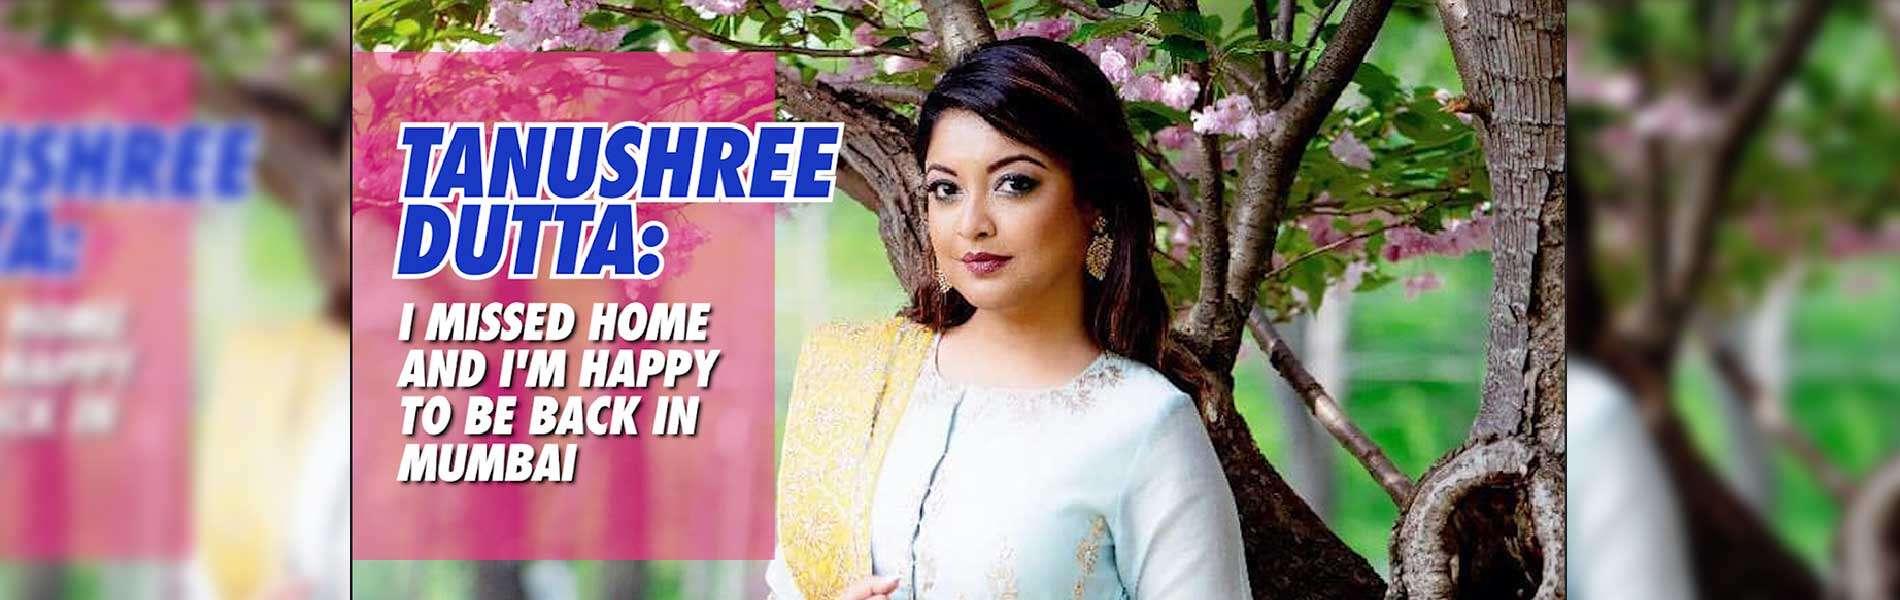 tanushree-dutta-i-missed-home-and-im-happy-to-be-back-in-mumbai